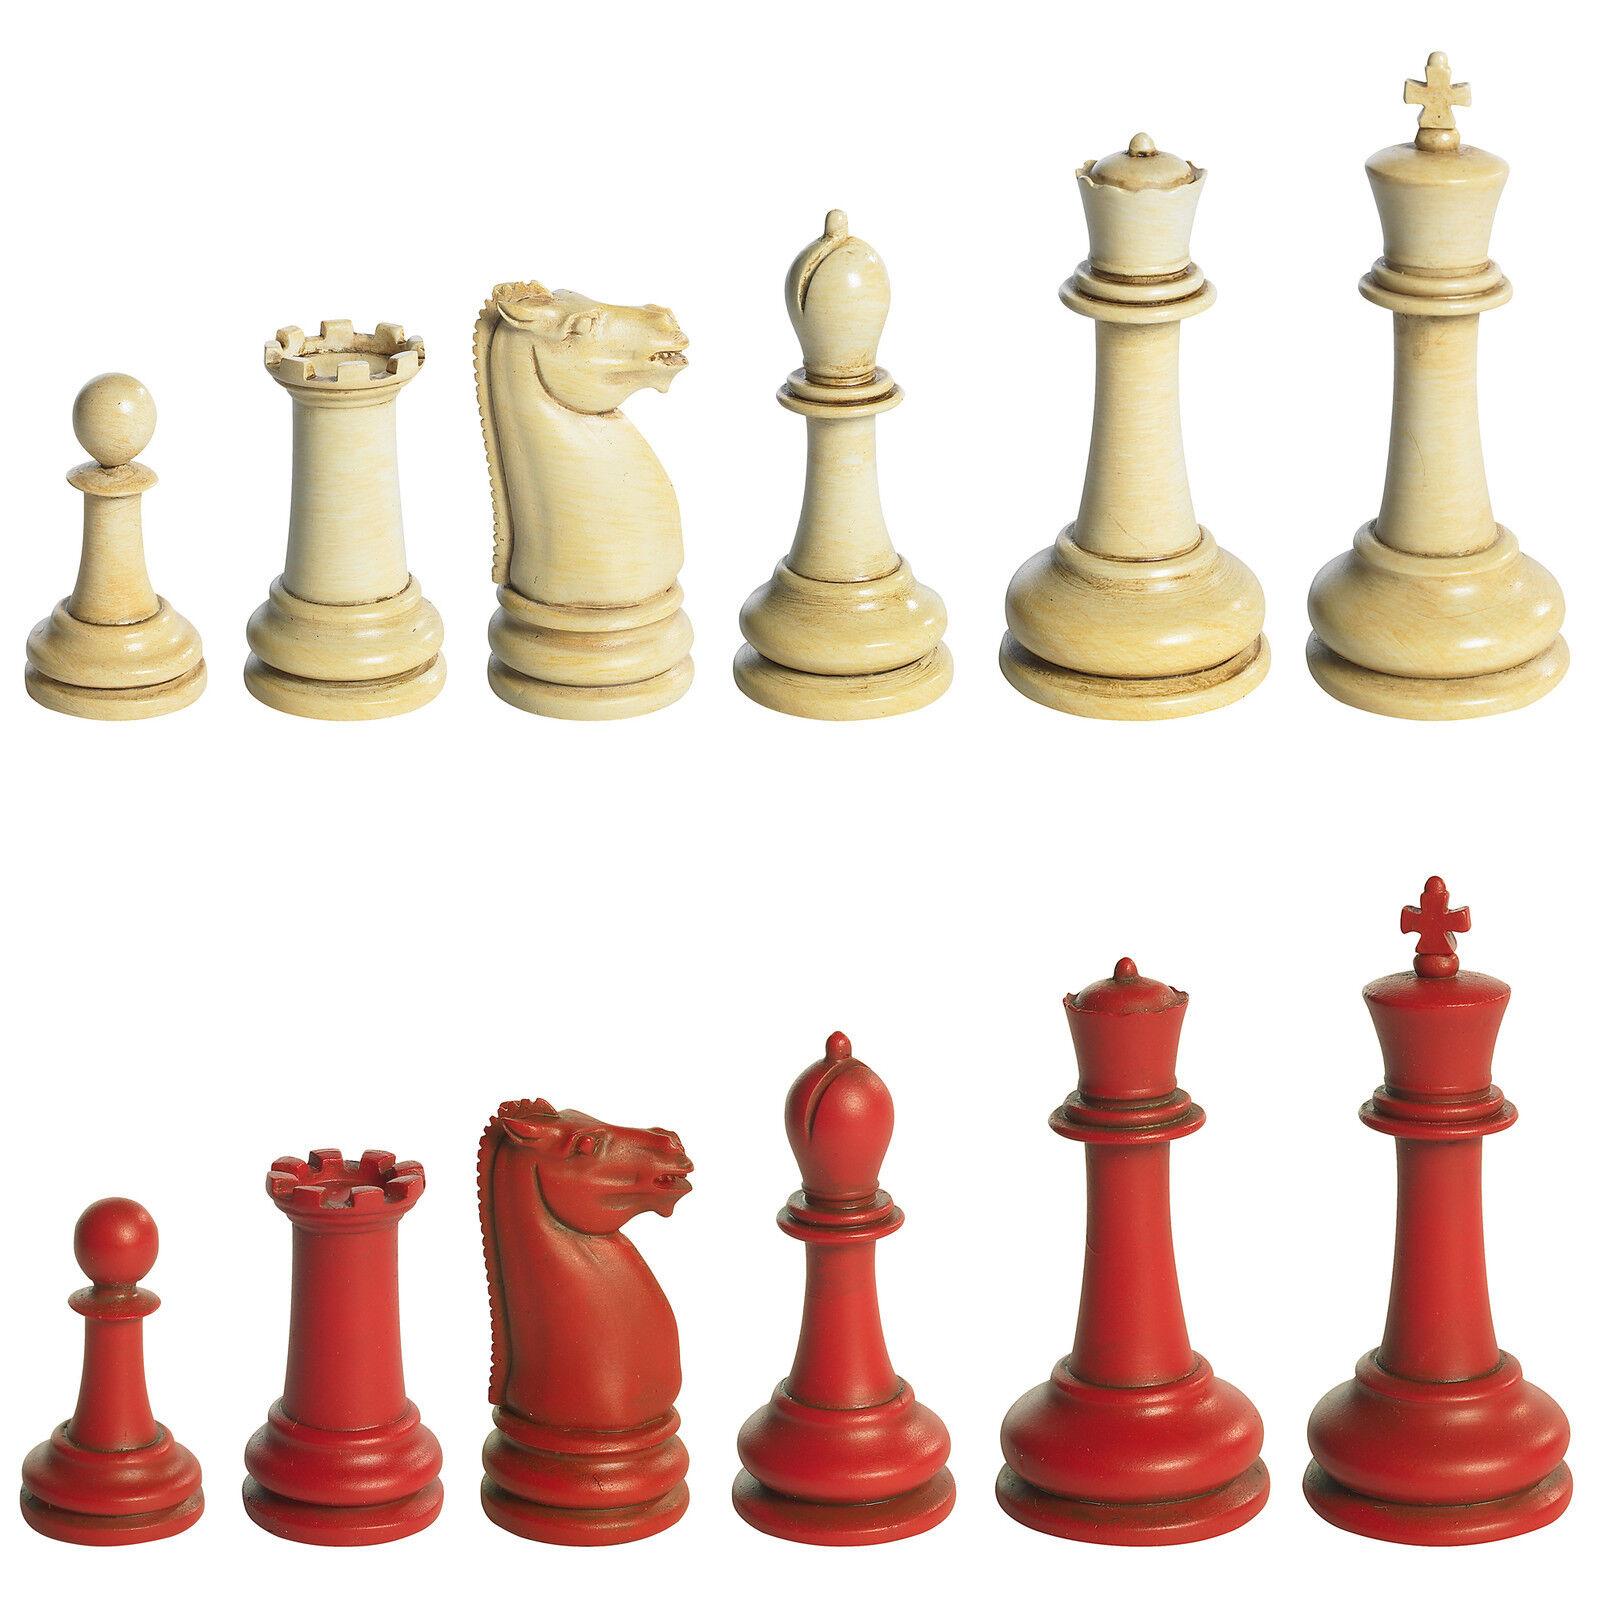 Autentico Models GR021 Classic Staunton Chess Set